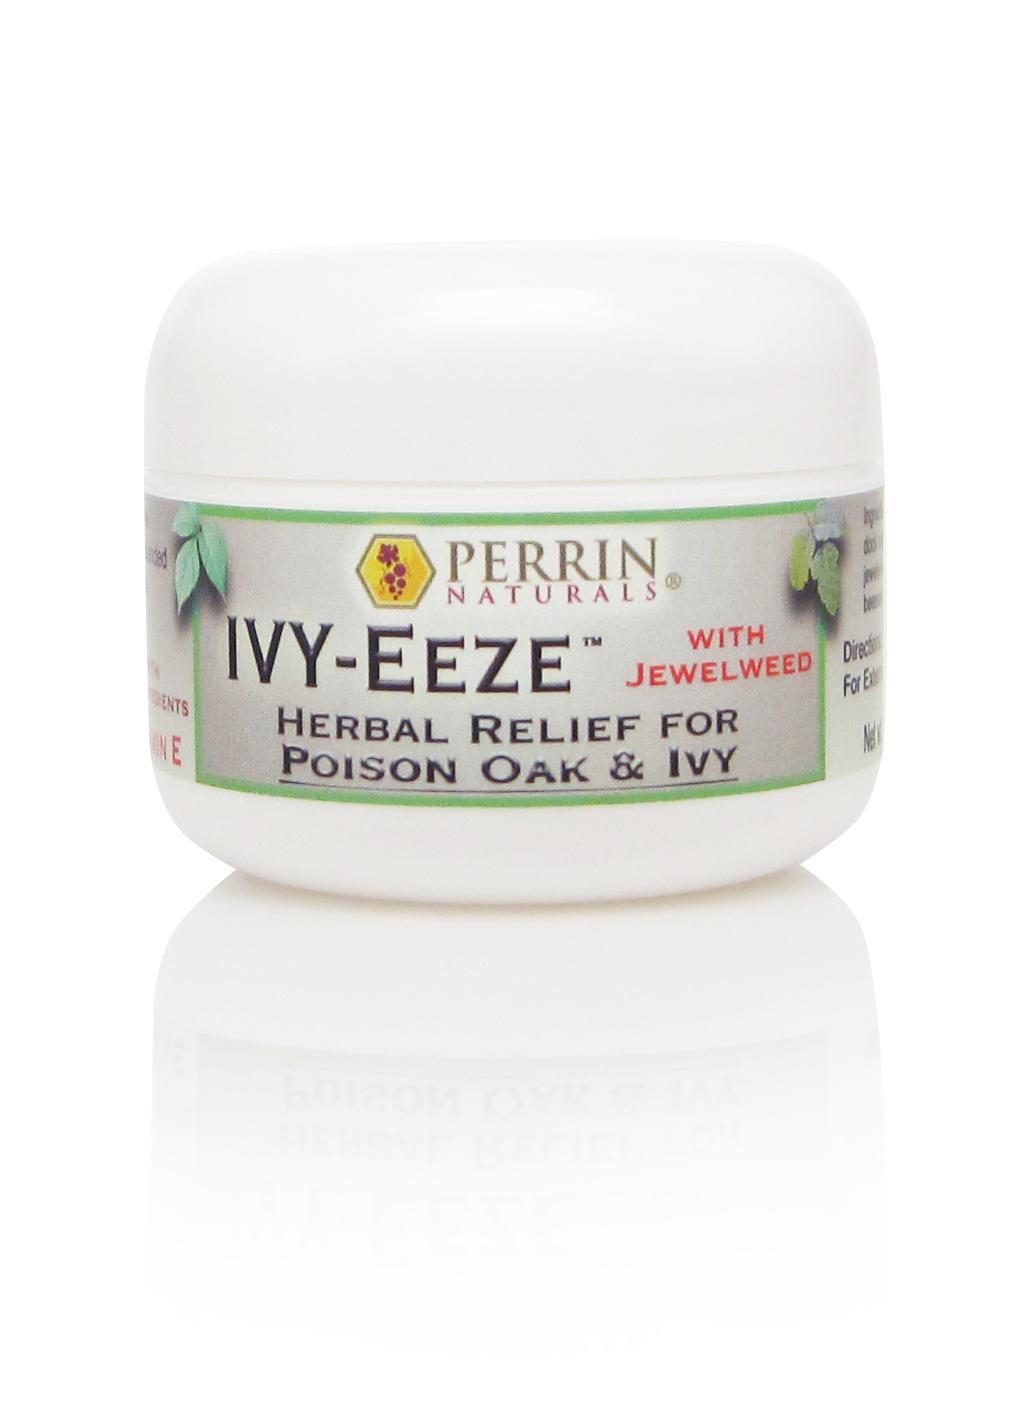 perrin naturals ivy eeze cream